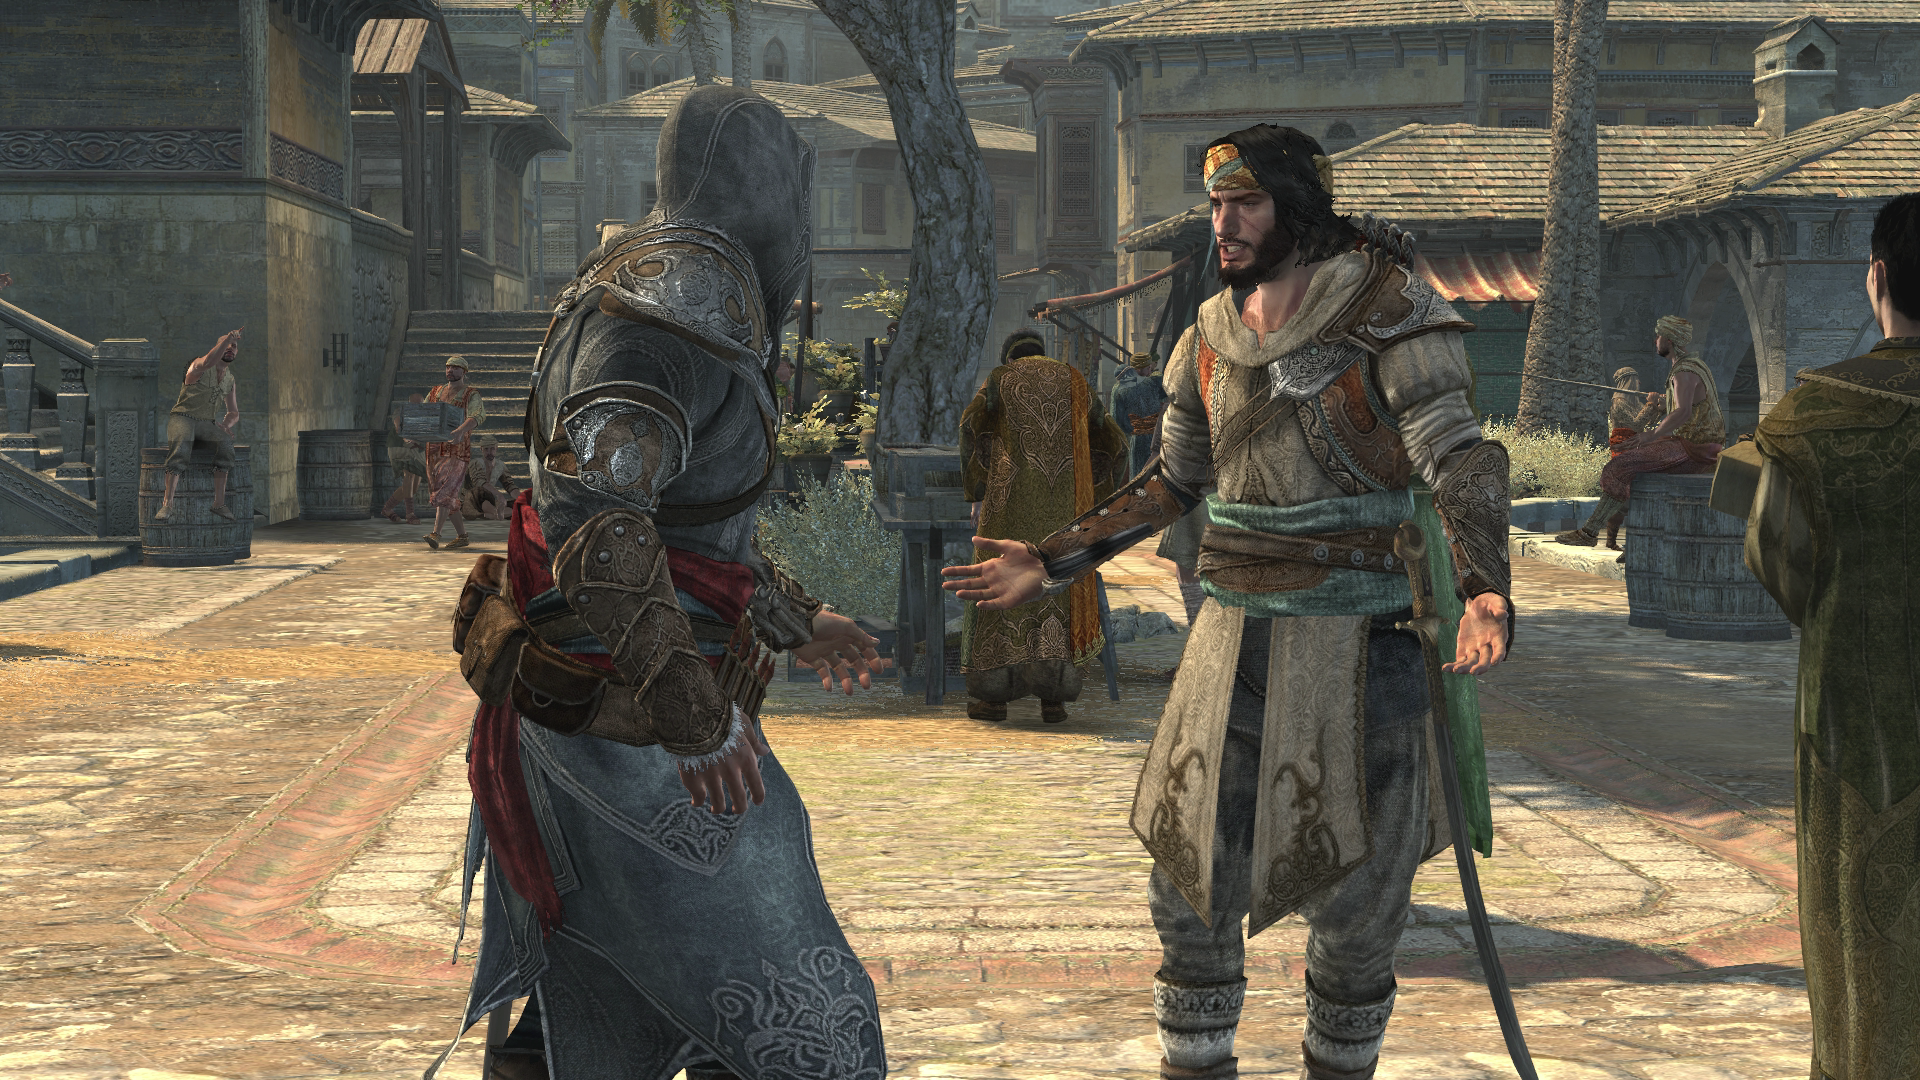 Assassin S Creed Revelations Dhimasaditya366